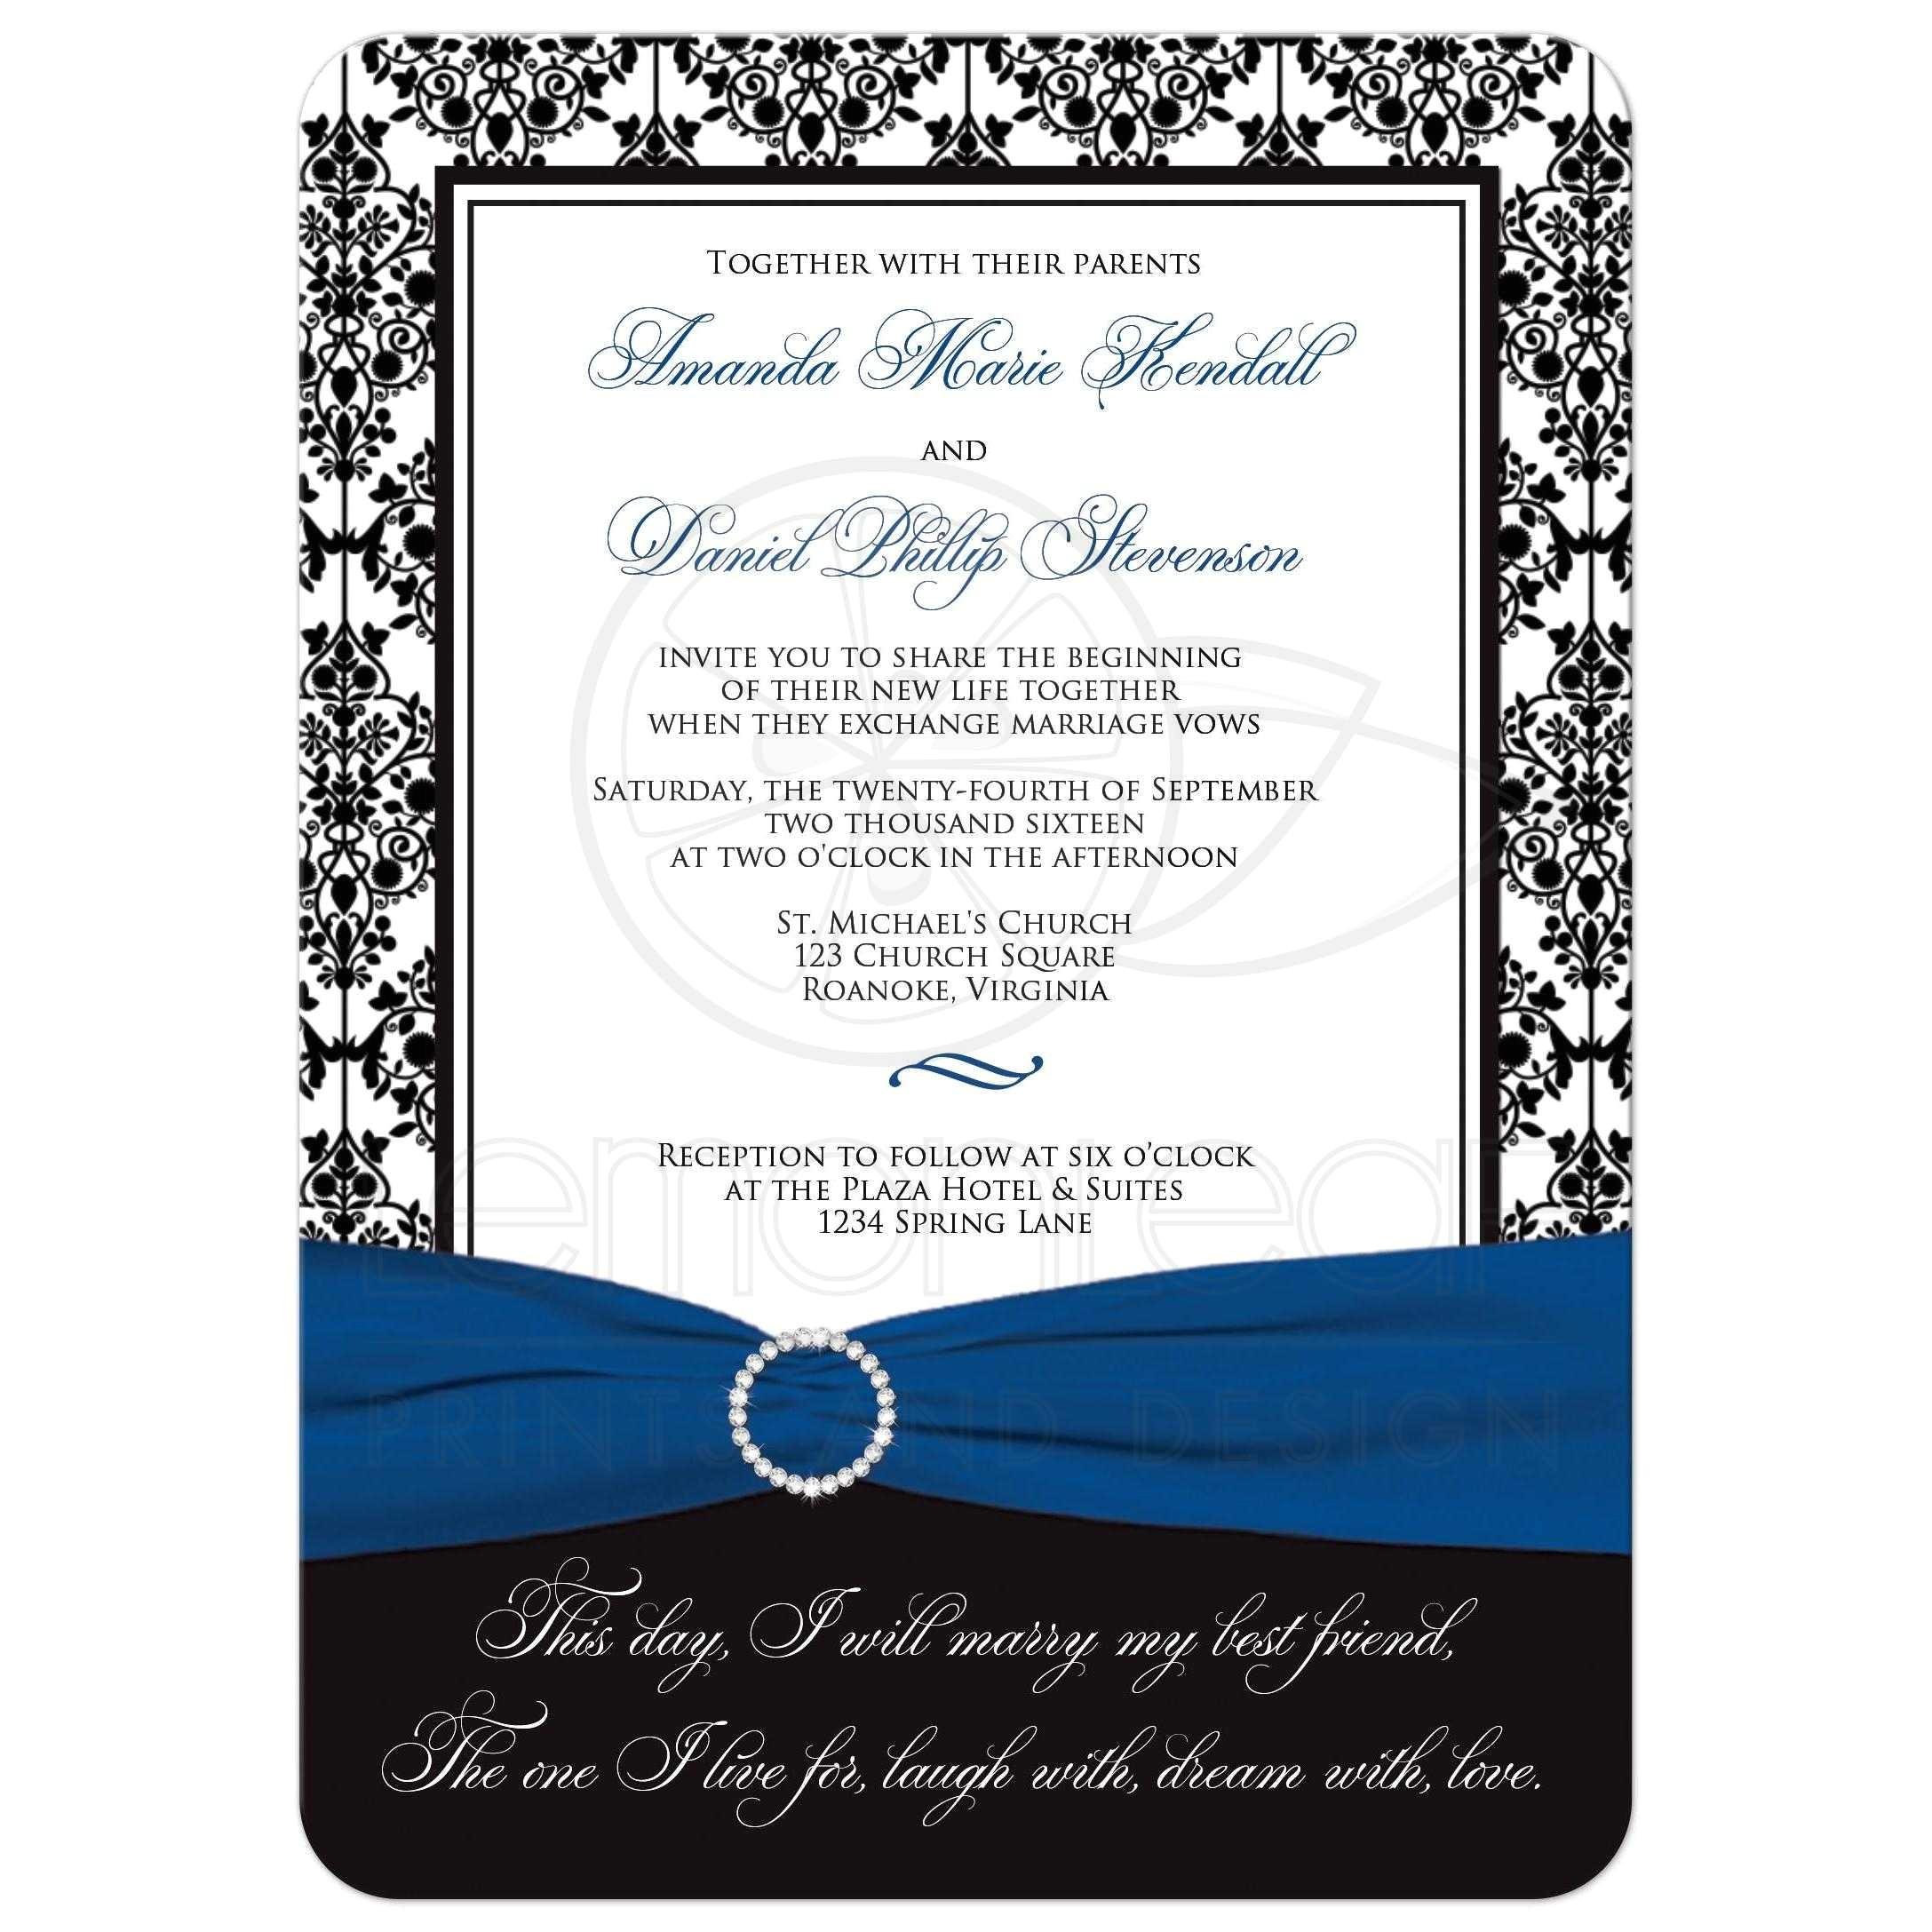 wedding invitation black white damask printed royal blue ribbon printed jewel brooch